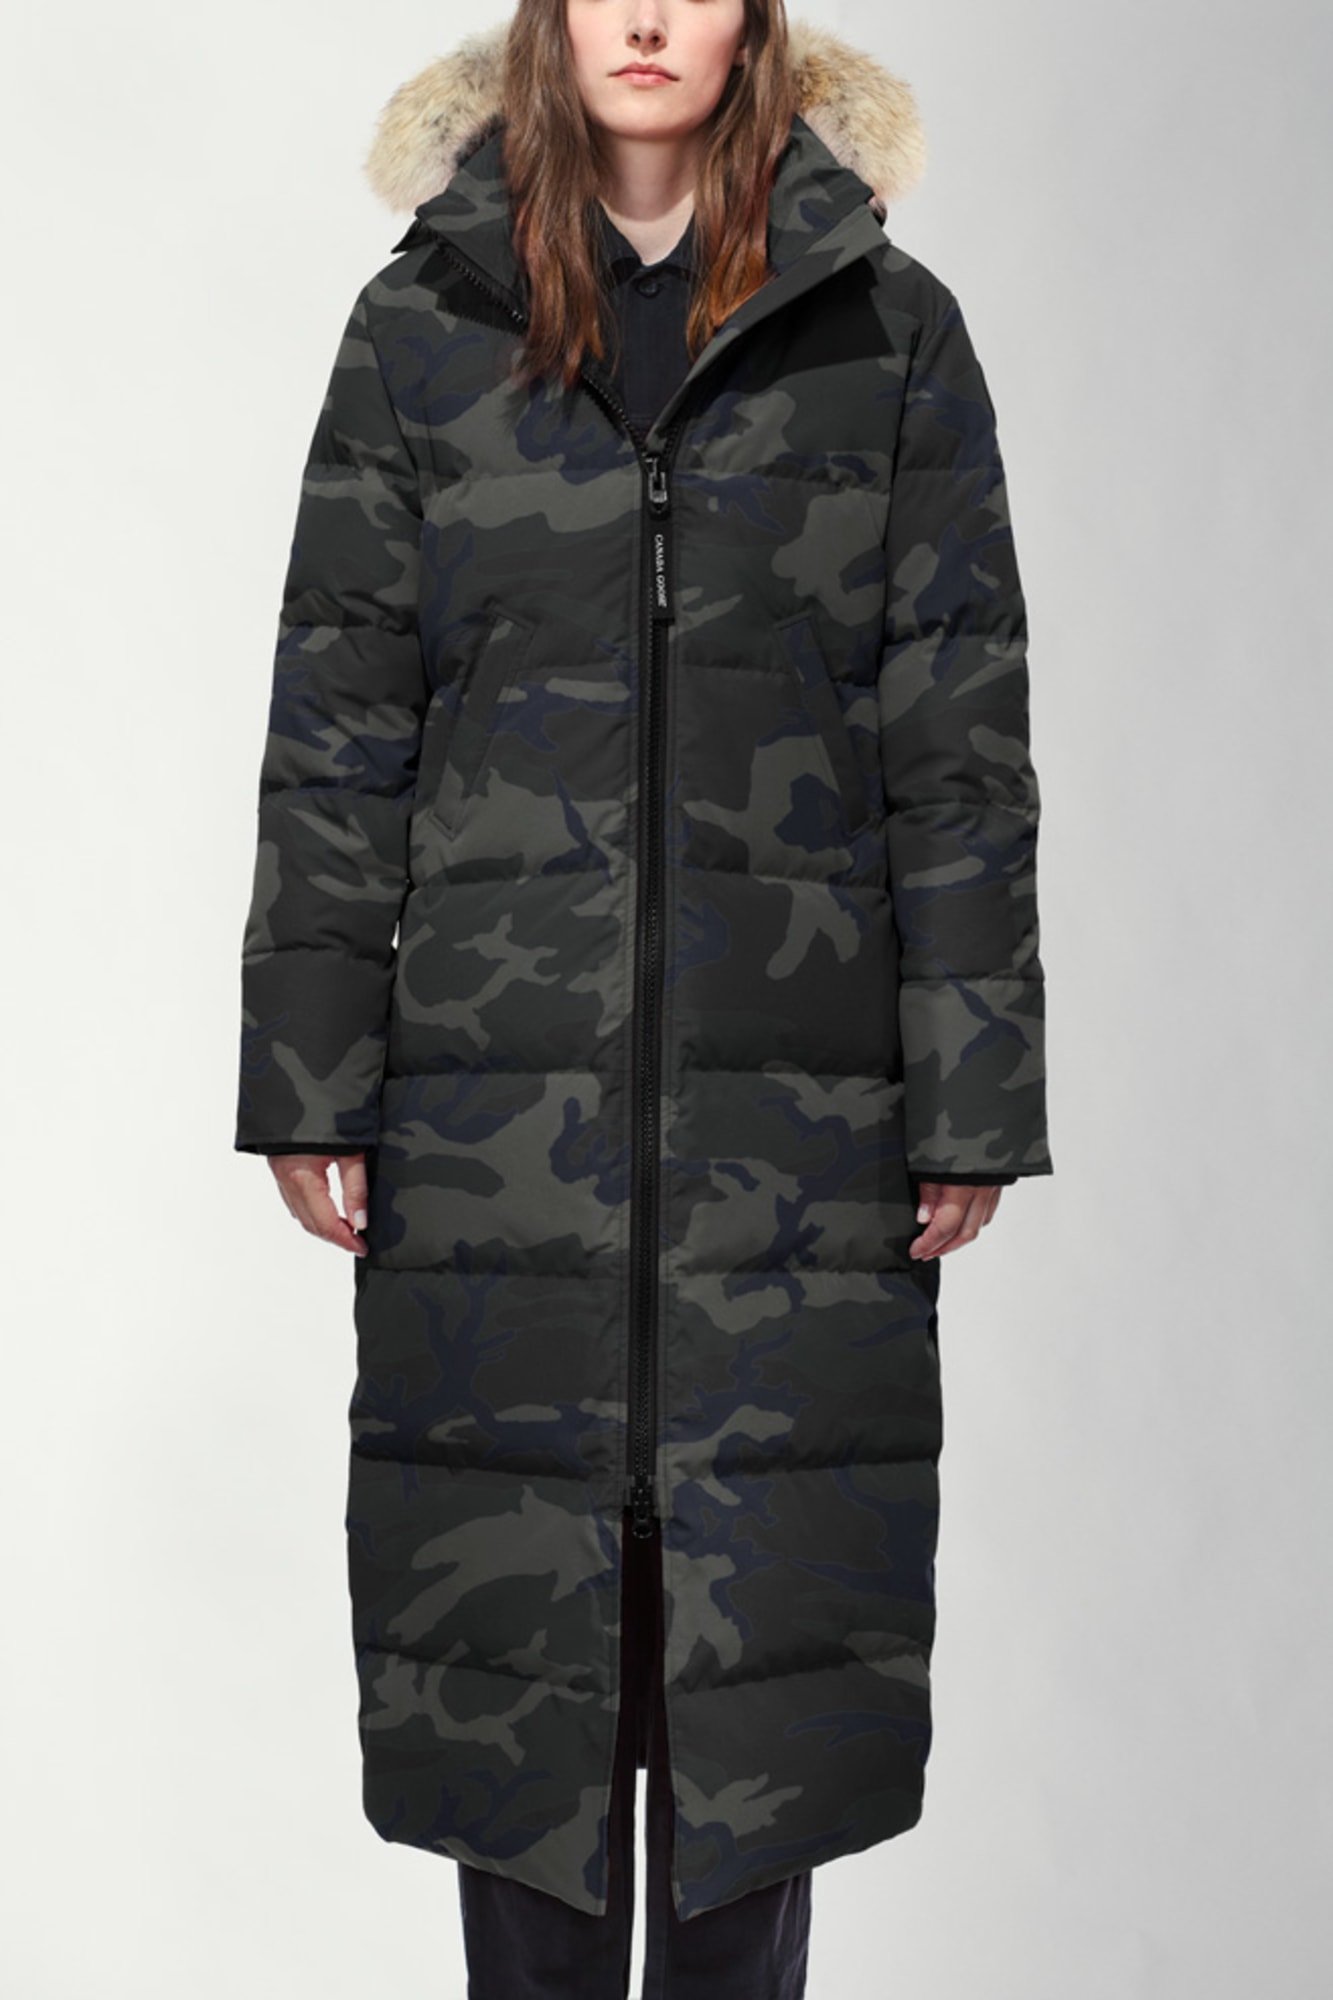 Canada Goose Mystique Parka Black Women Down Jacket